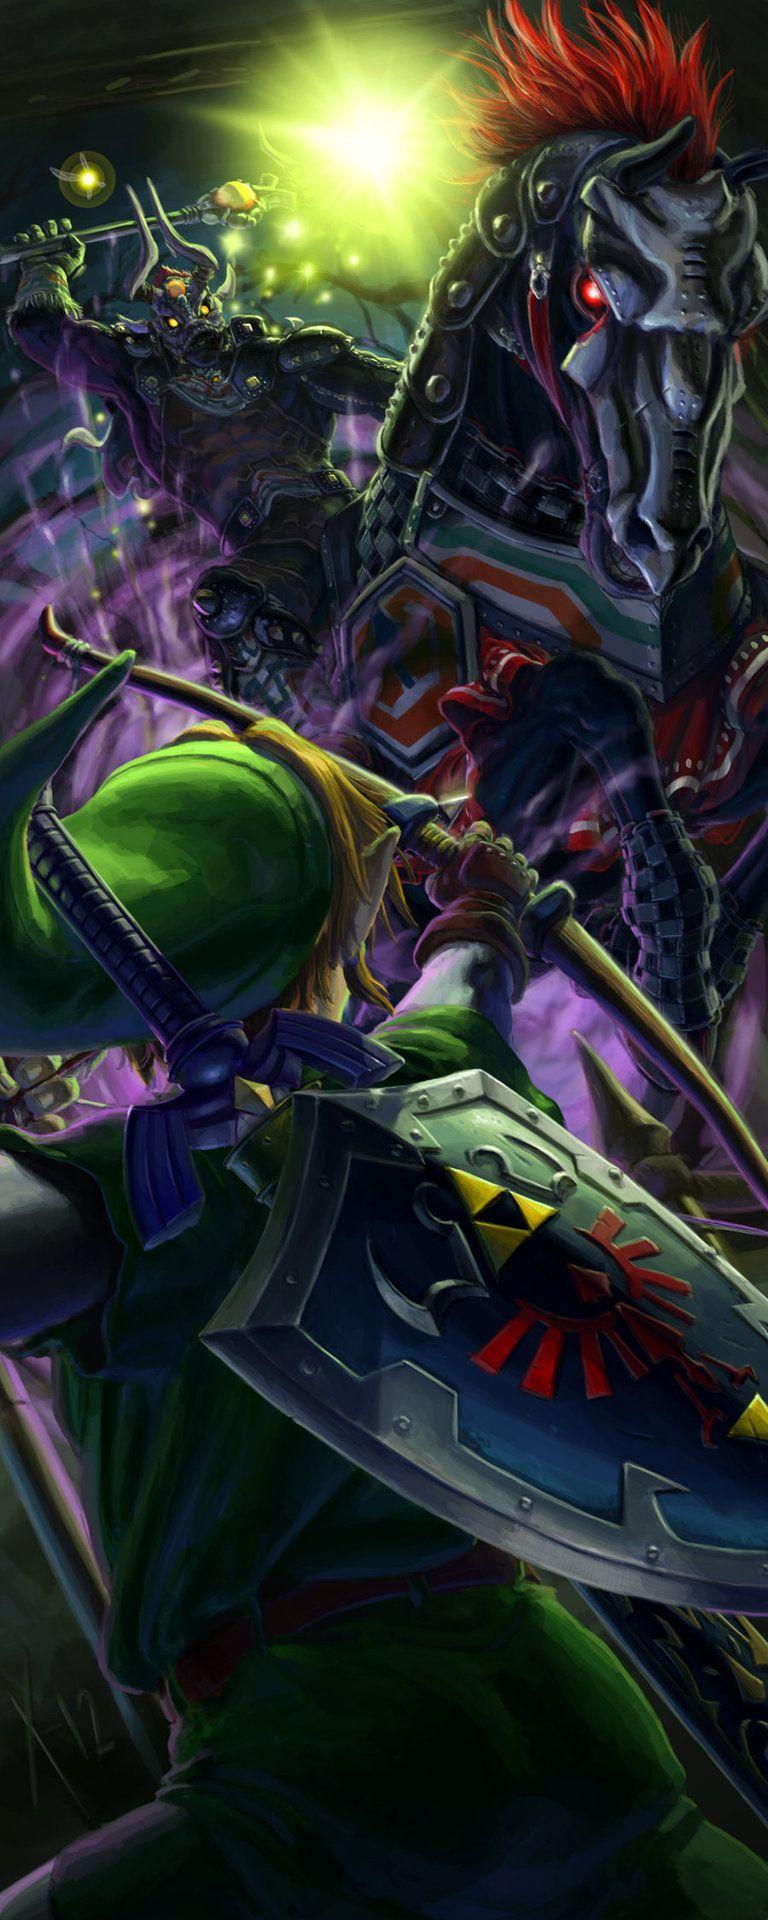 Link vs Phantom Ganon Ocarina of time, Zelda art